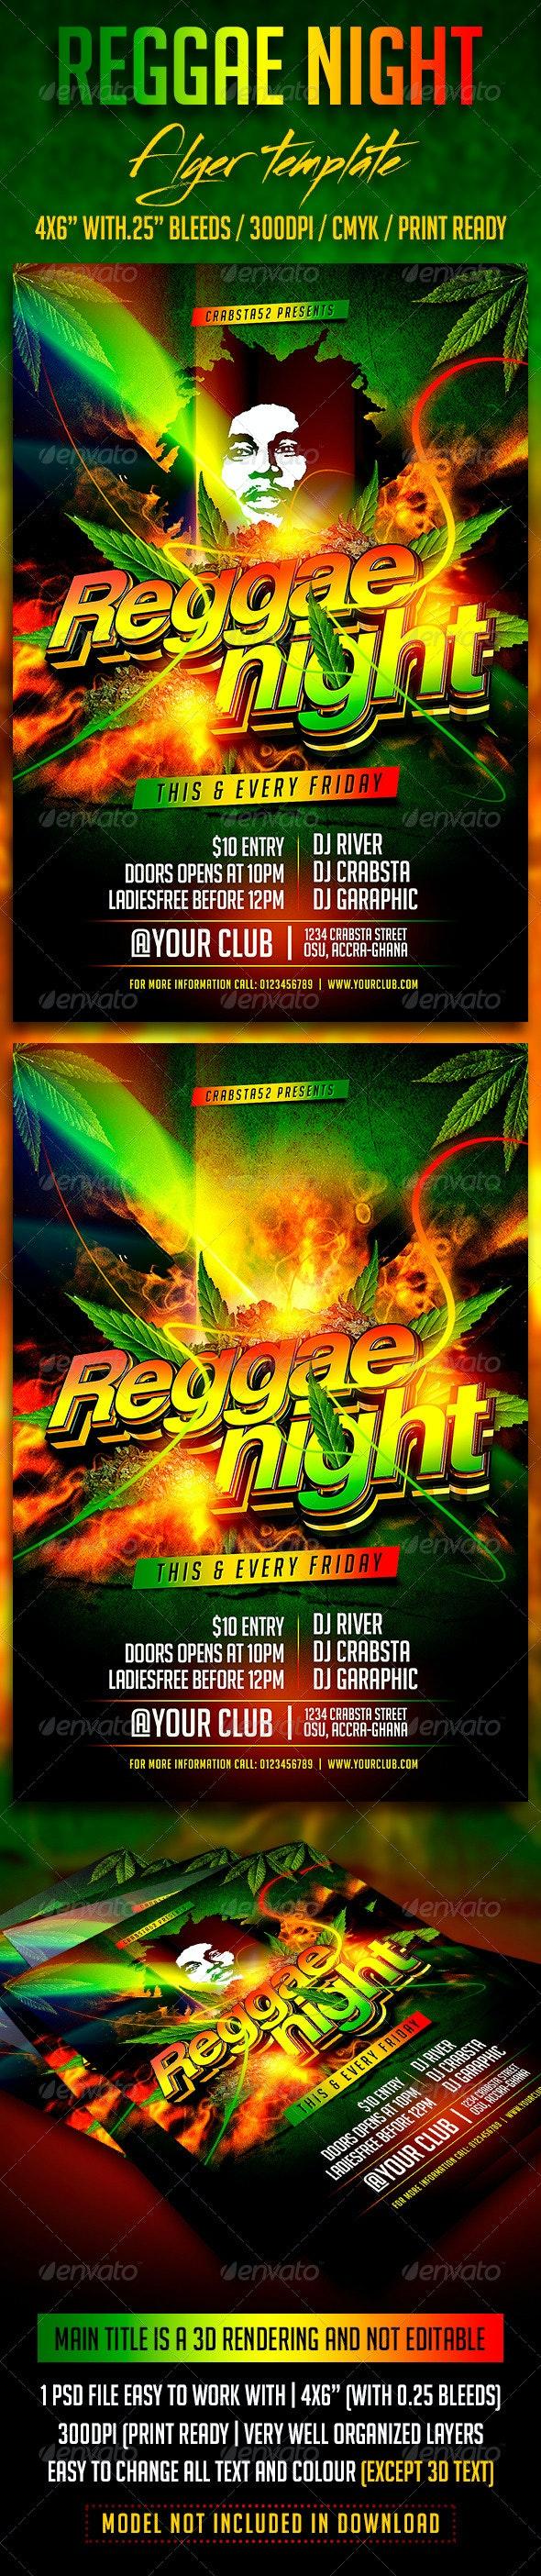 Reggae Night Flyer Template - Flyers Print Templates